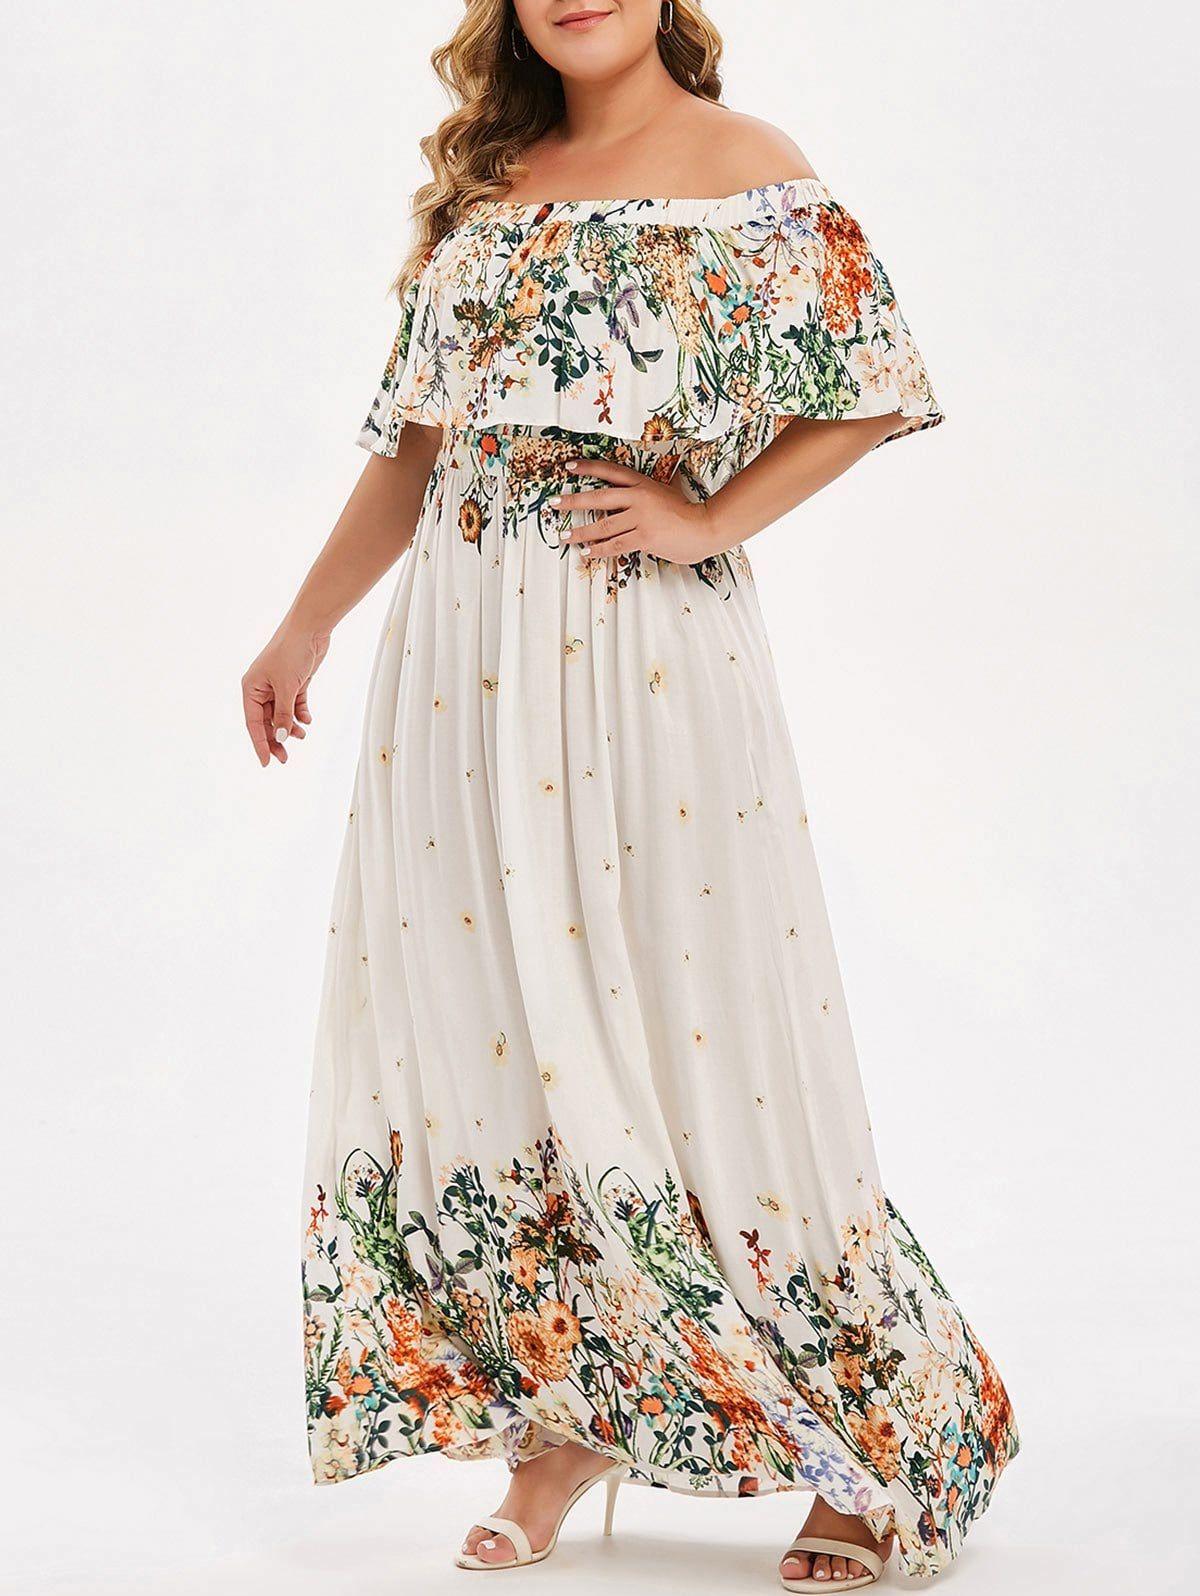 Plus Size Off Shoulder Ruffled Floral Maxi Dress Maxi Dress Ruffle Floral Maxi Dress Floral Maxi Dress [ 1596 x 1200 Pixel ]